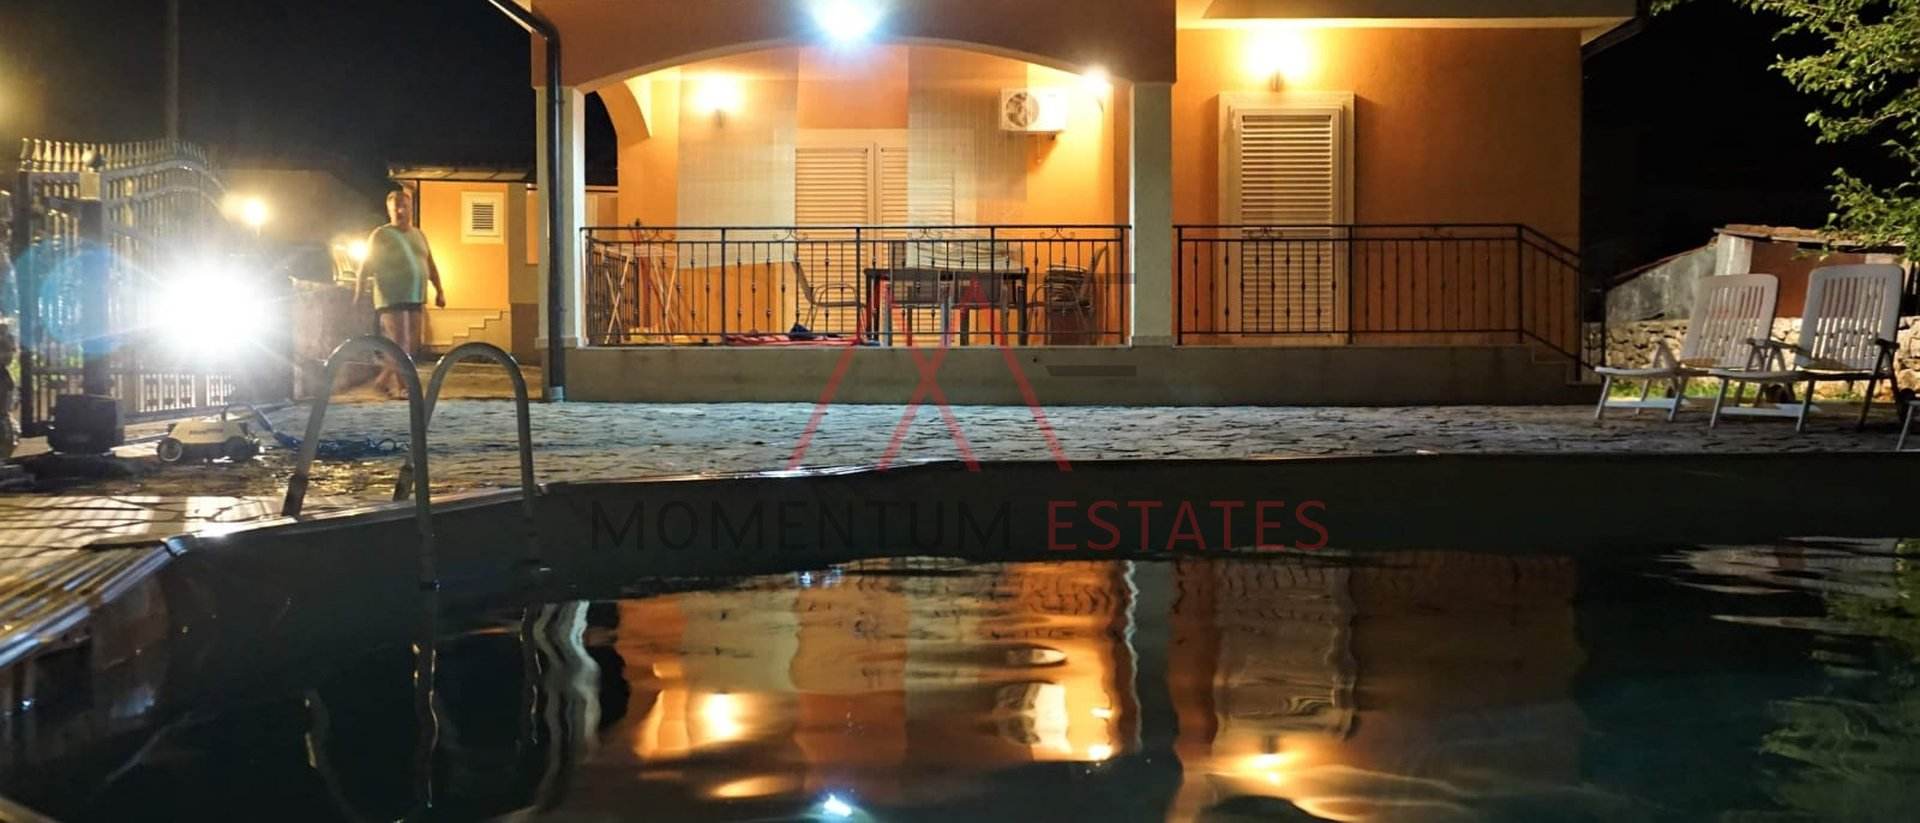 Hiša, 160 m2, Prodaja, Malinska - Sveti Anton